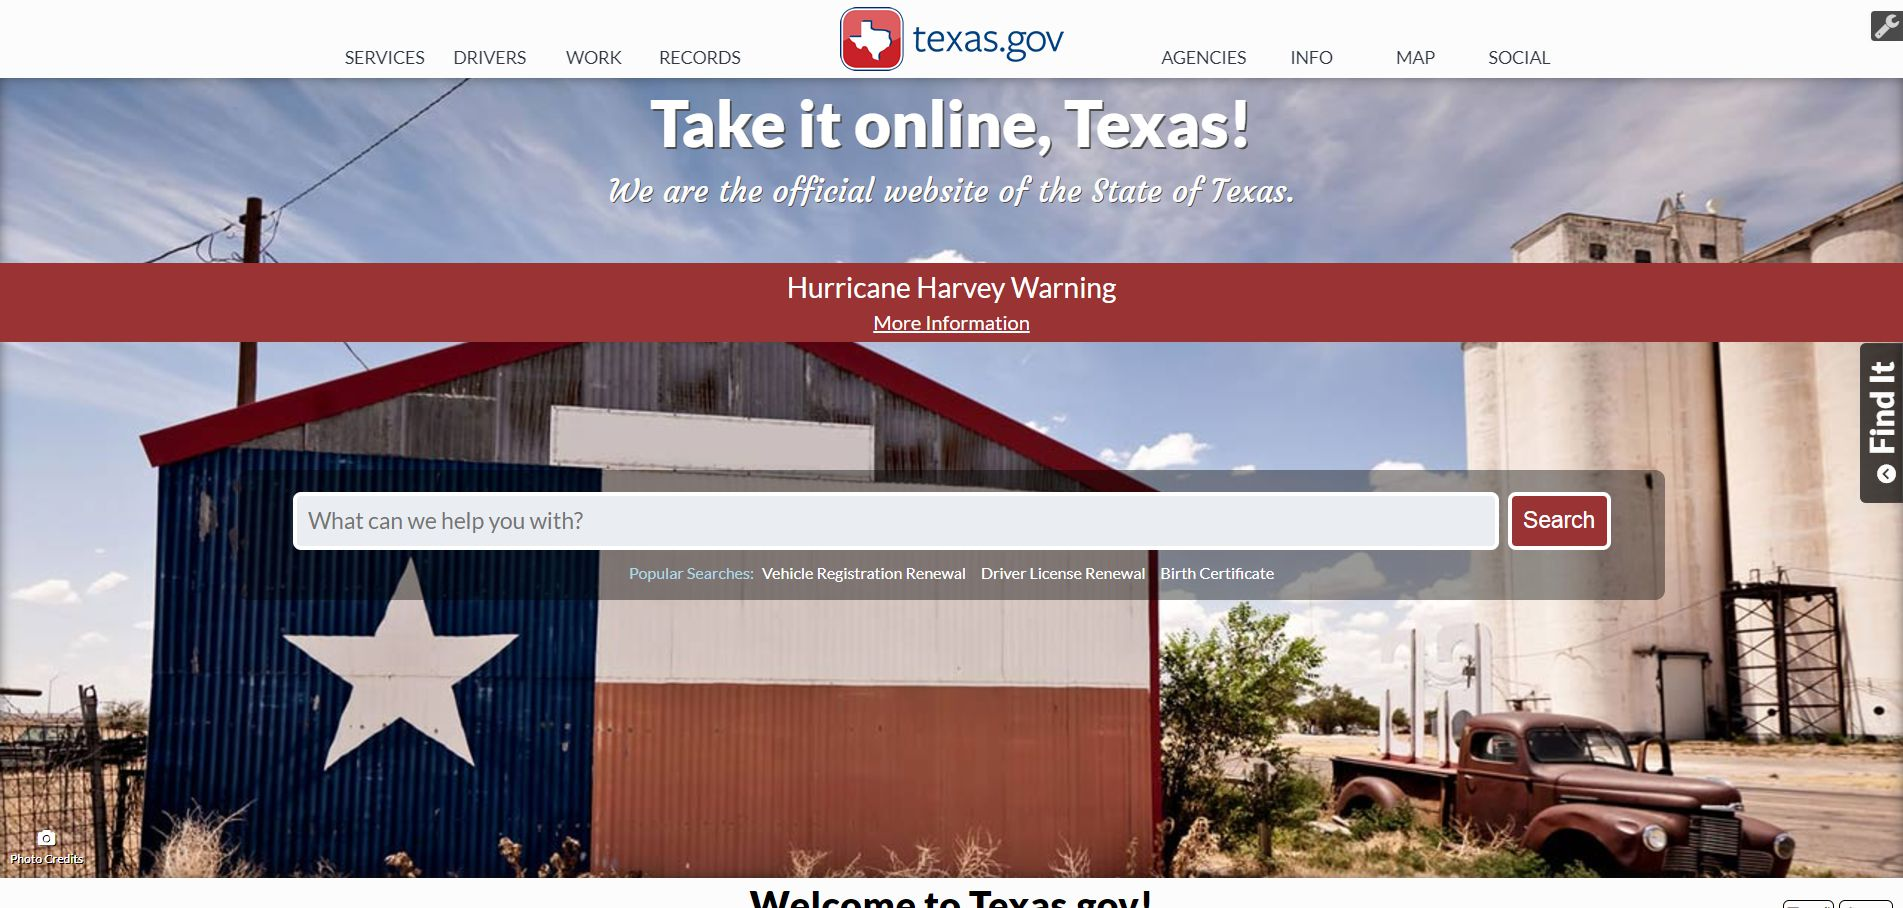 Texas.gov after Hurricane Harvey